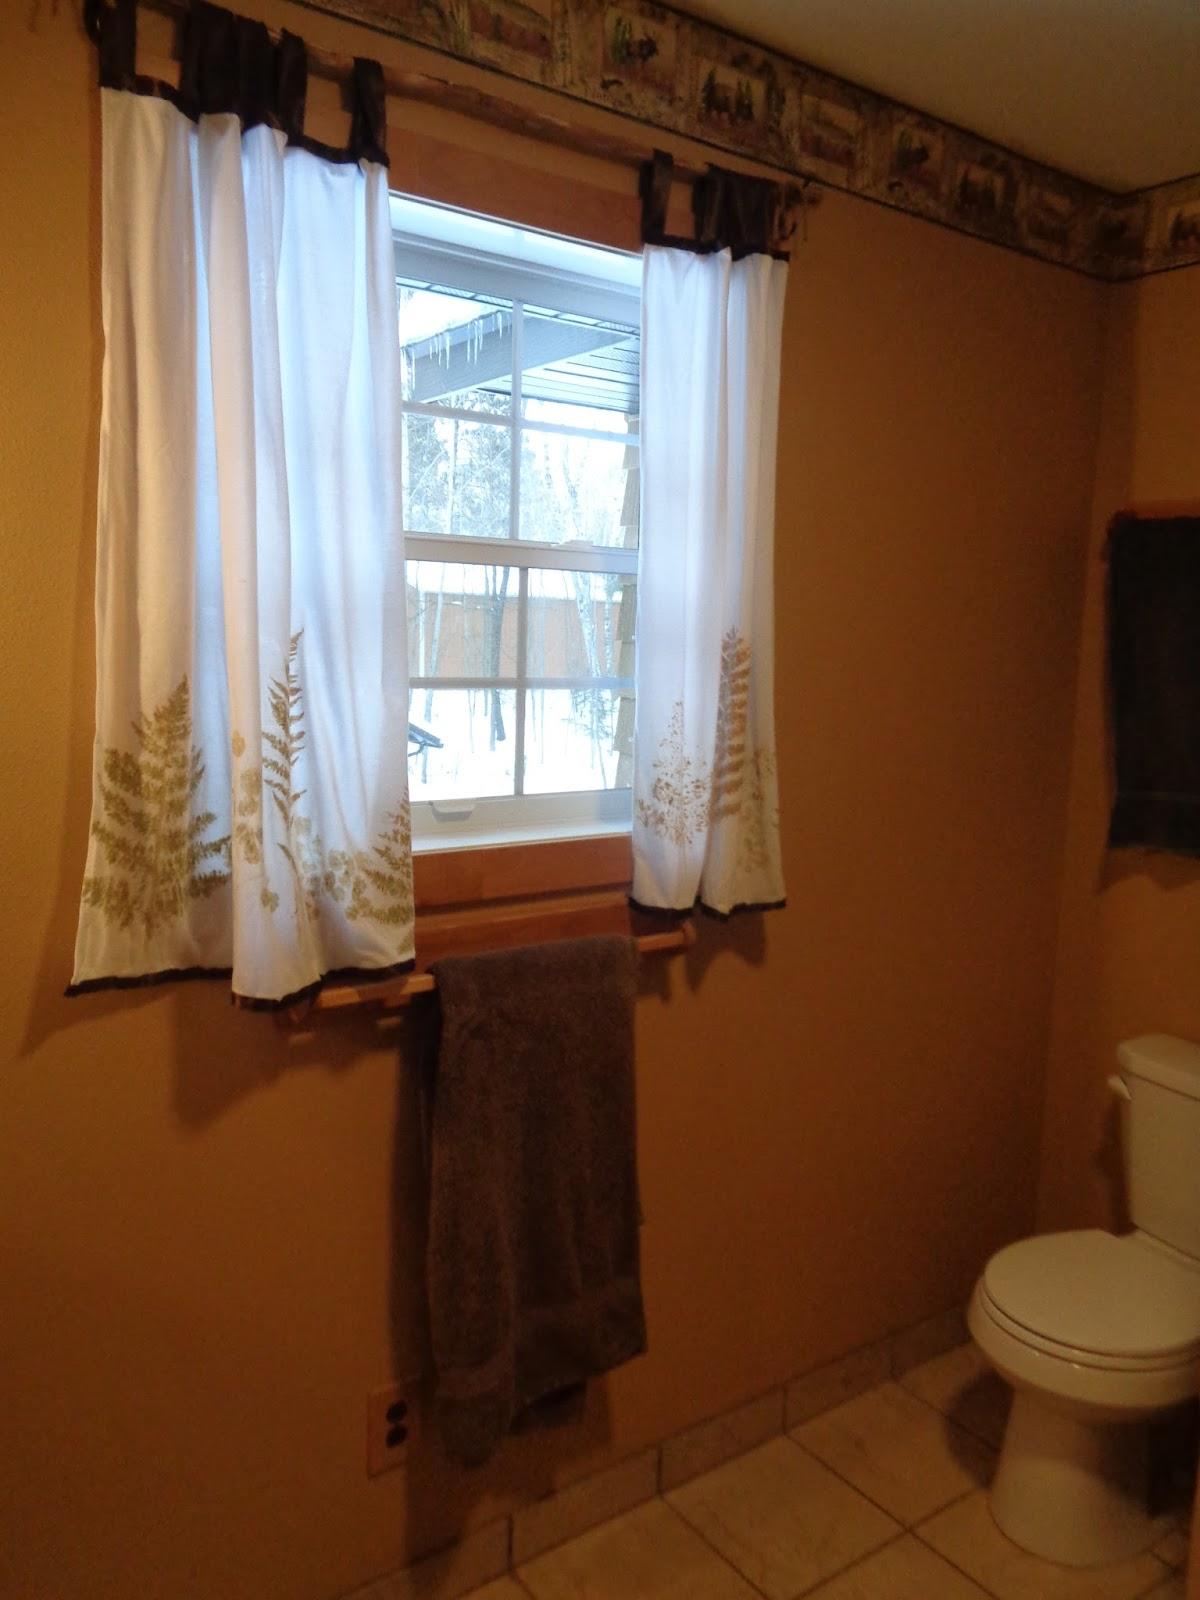 Proverbs 31 living an upstairs bathroom tour for Megan u bathroom tour